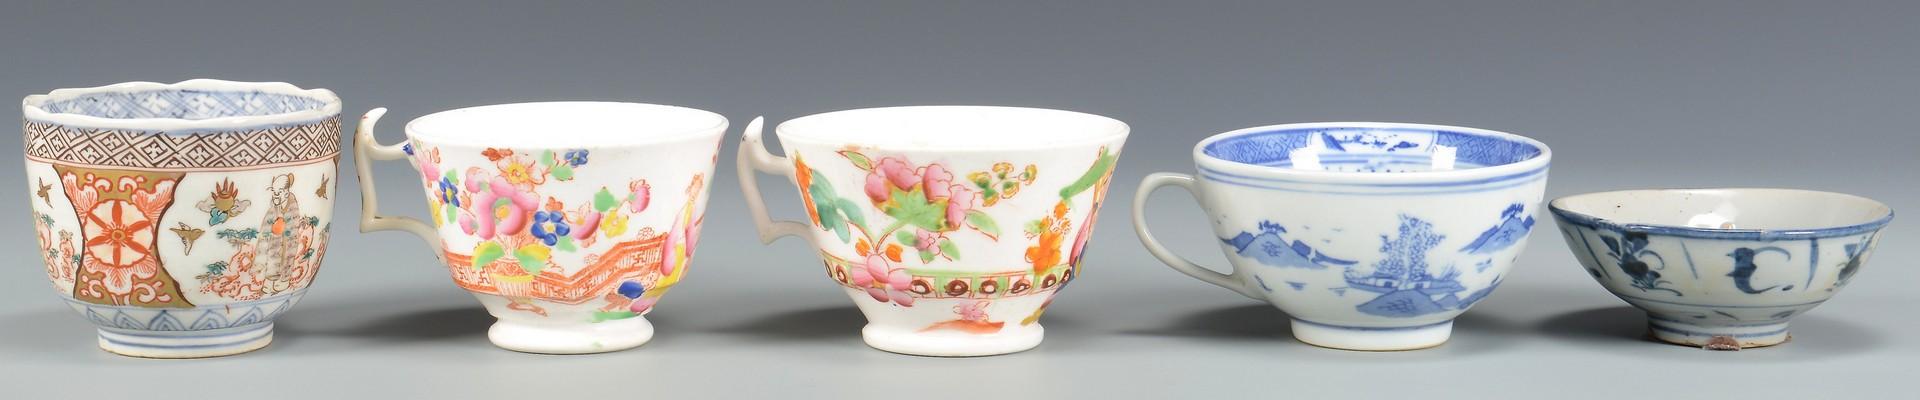 Lot 3832424: Group of Asian & English Porcelain, 14 pcs.